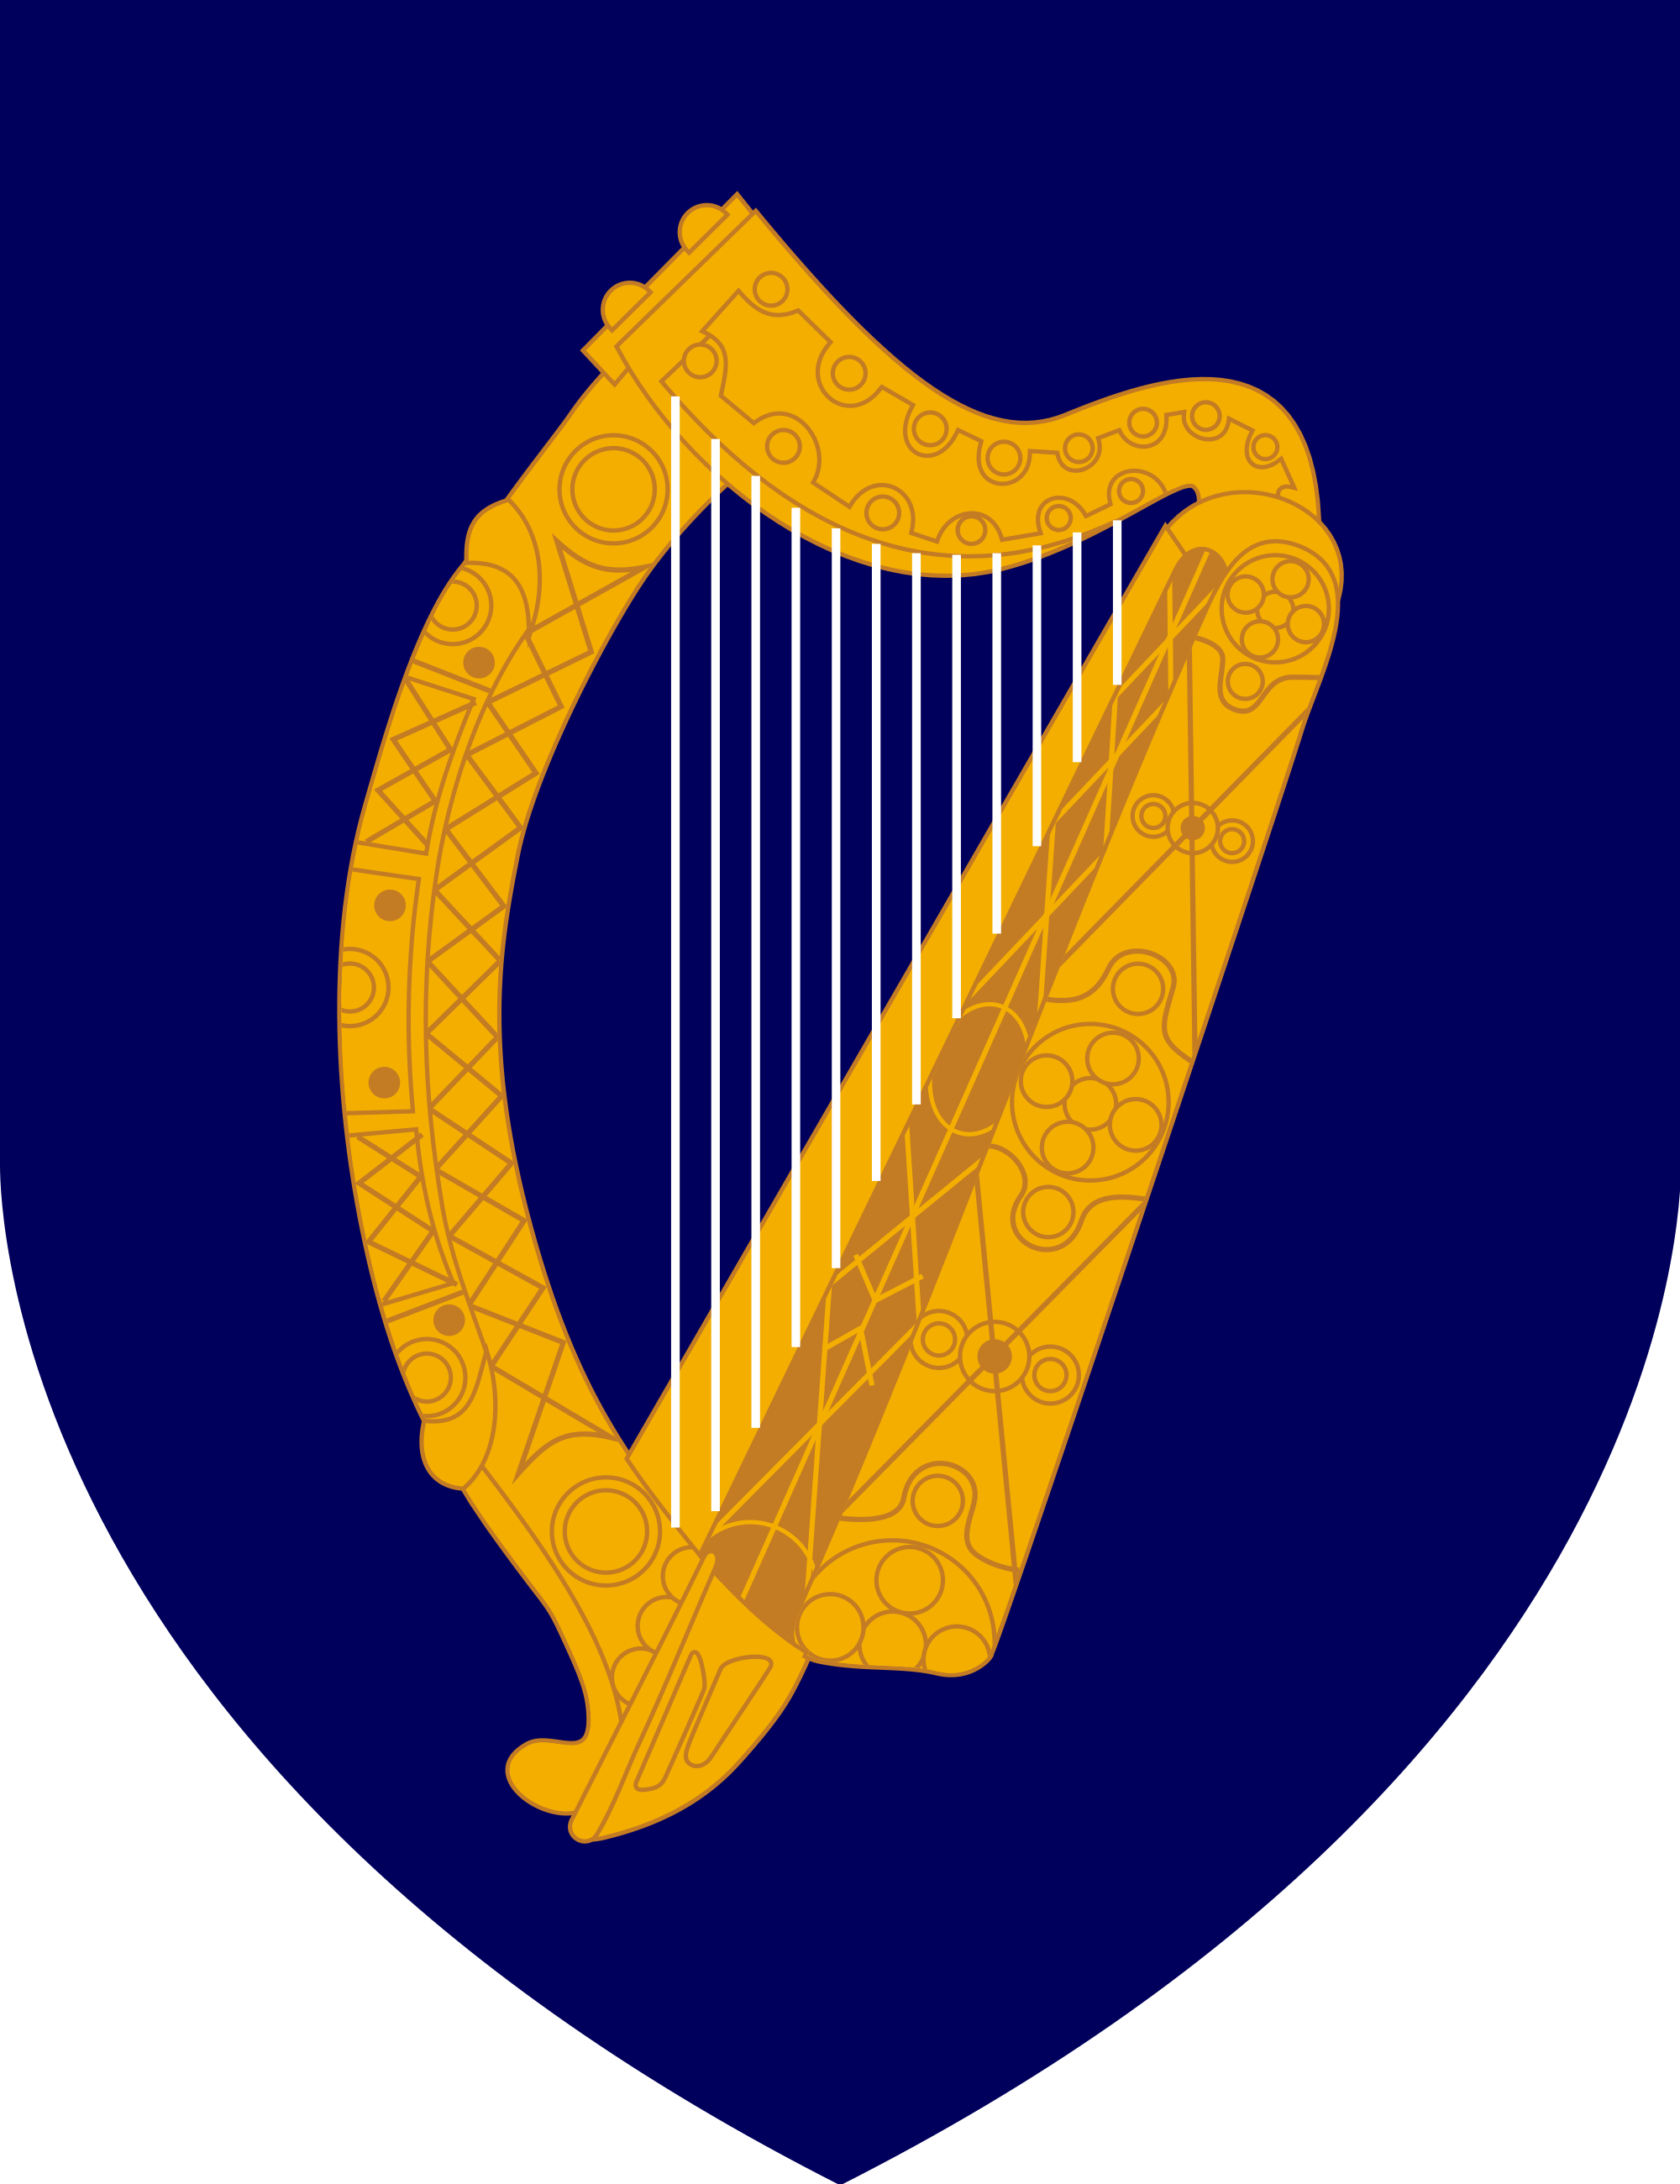 Wapen van Ierland